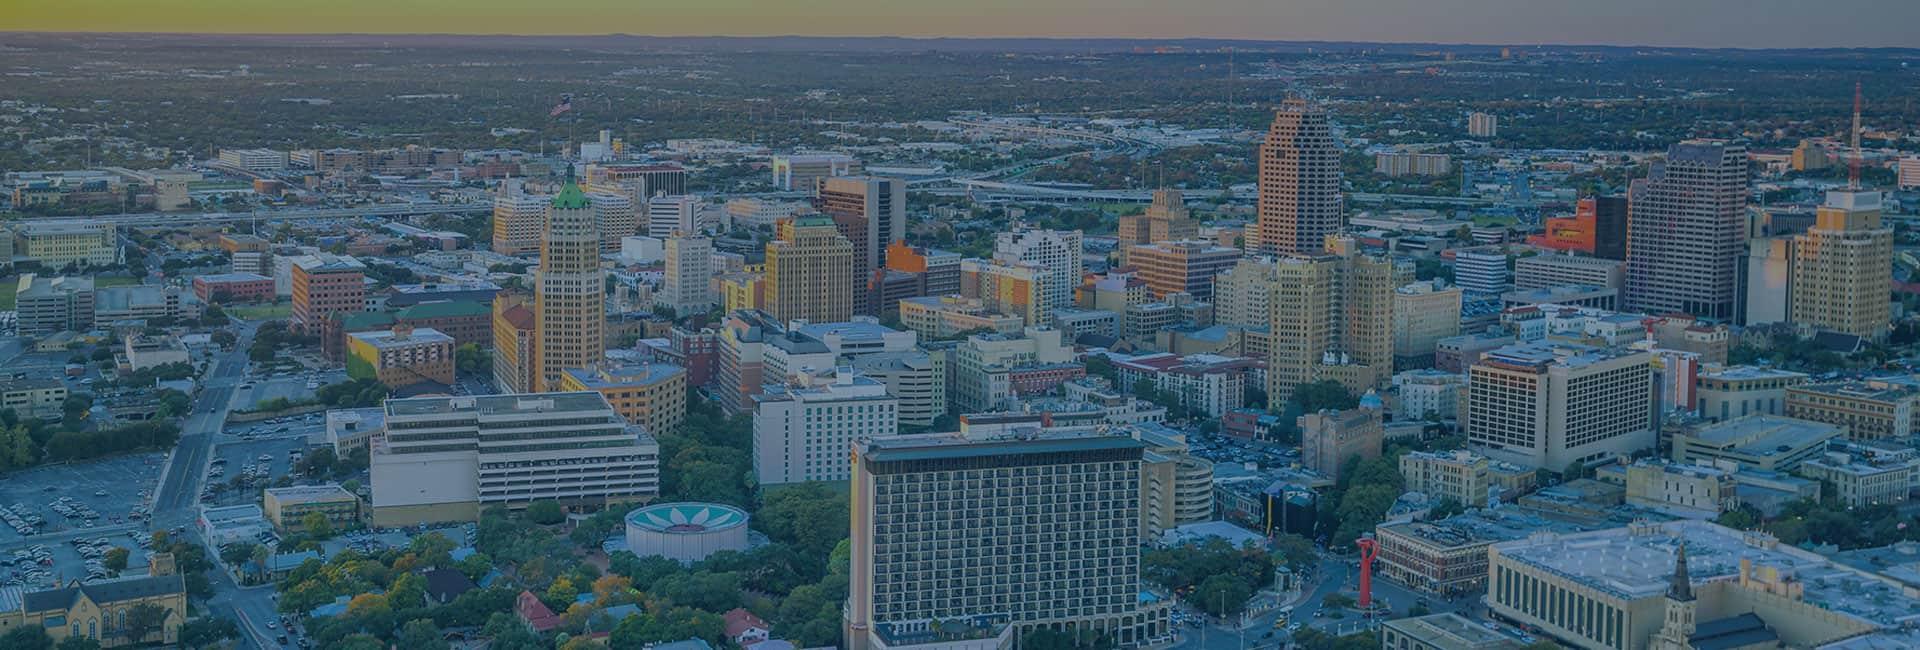 Case Study: San Antonio, TX